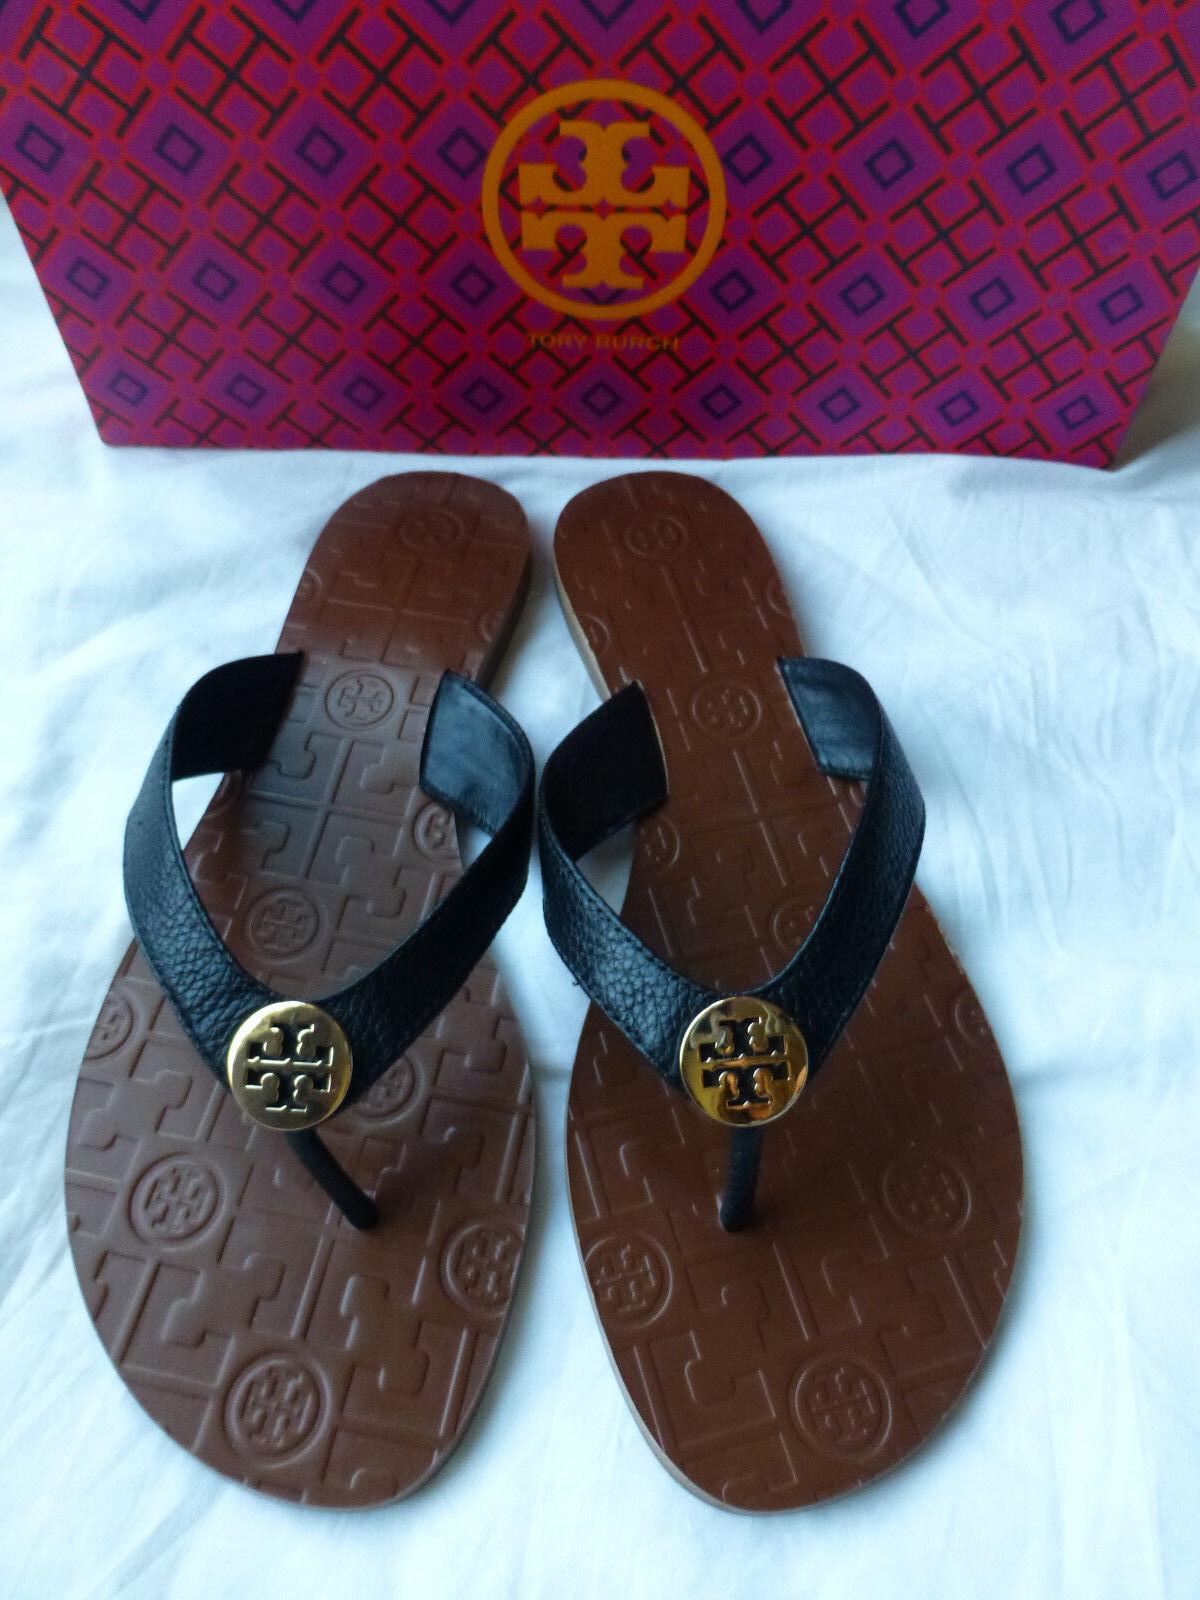 Miz Mooz Womens Cato Peep Toe Lace Sandal Currant Size 41 EU 10 US